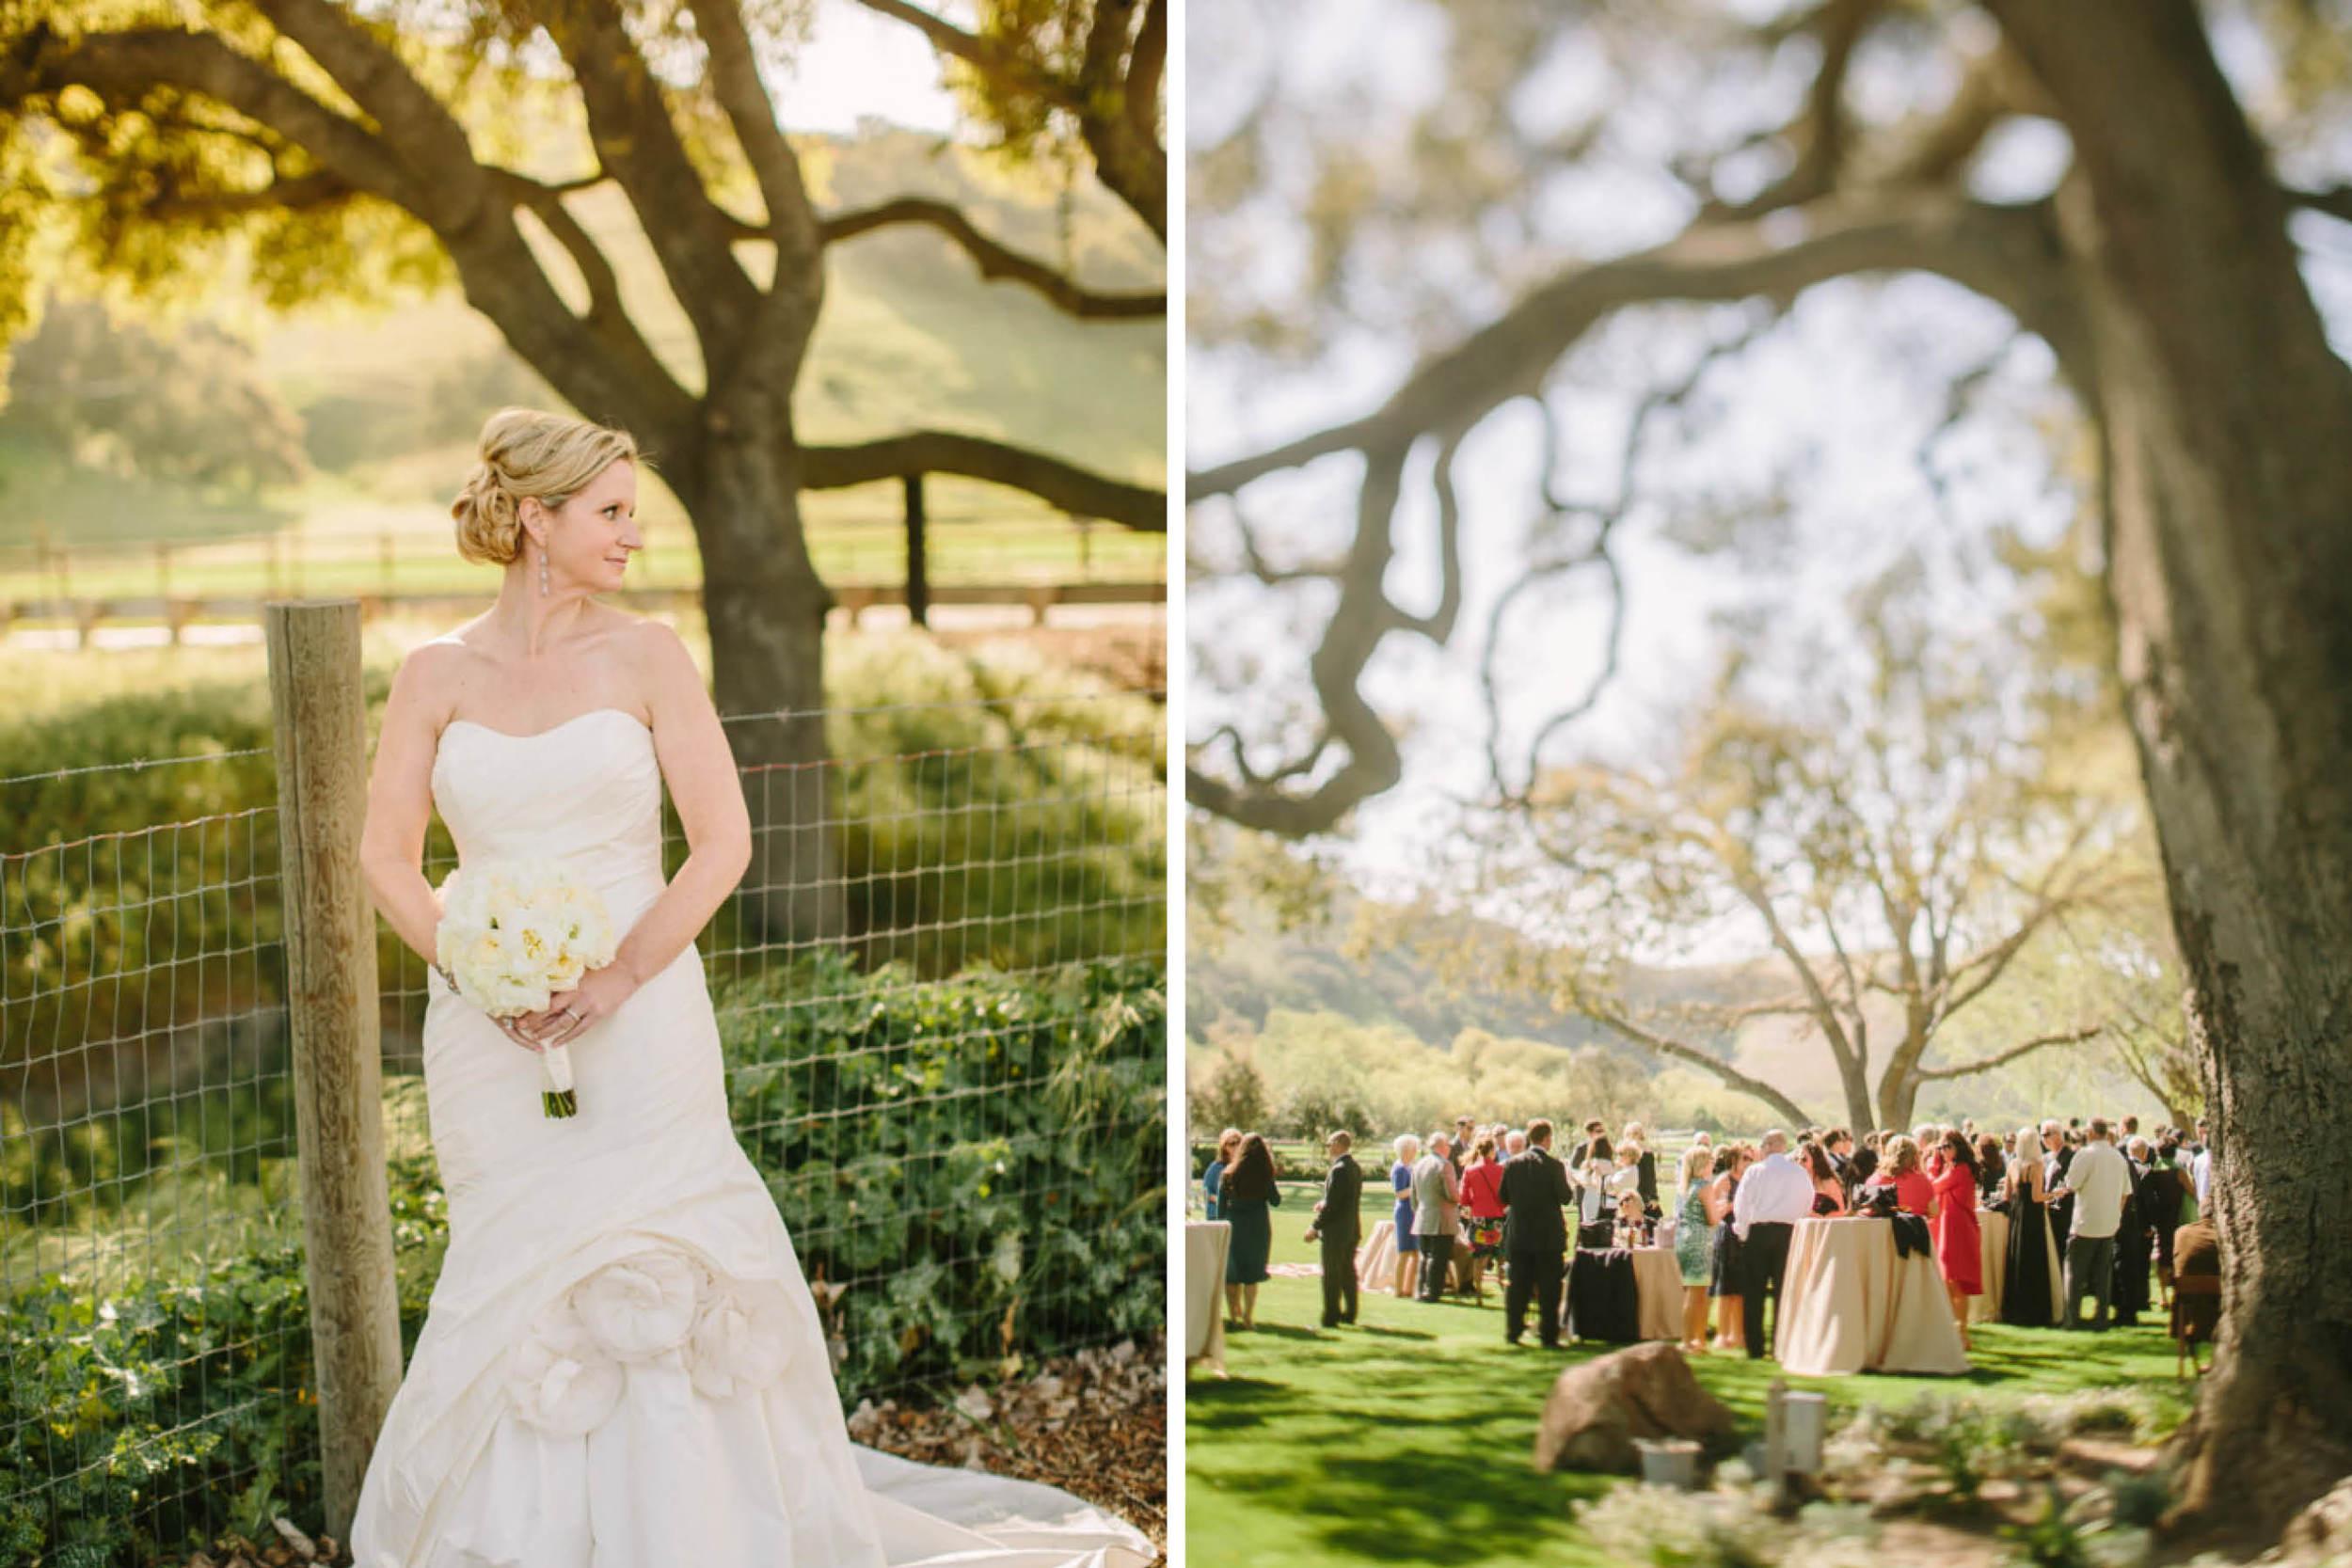 alegria-by-design-tres-hermanas-winery-vineyard-wedding-planner-coordinator-santa-barbara-ynez-maria (3).jpg